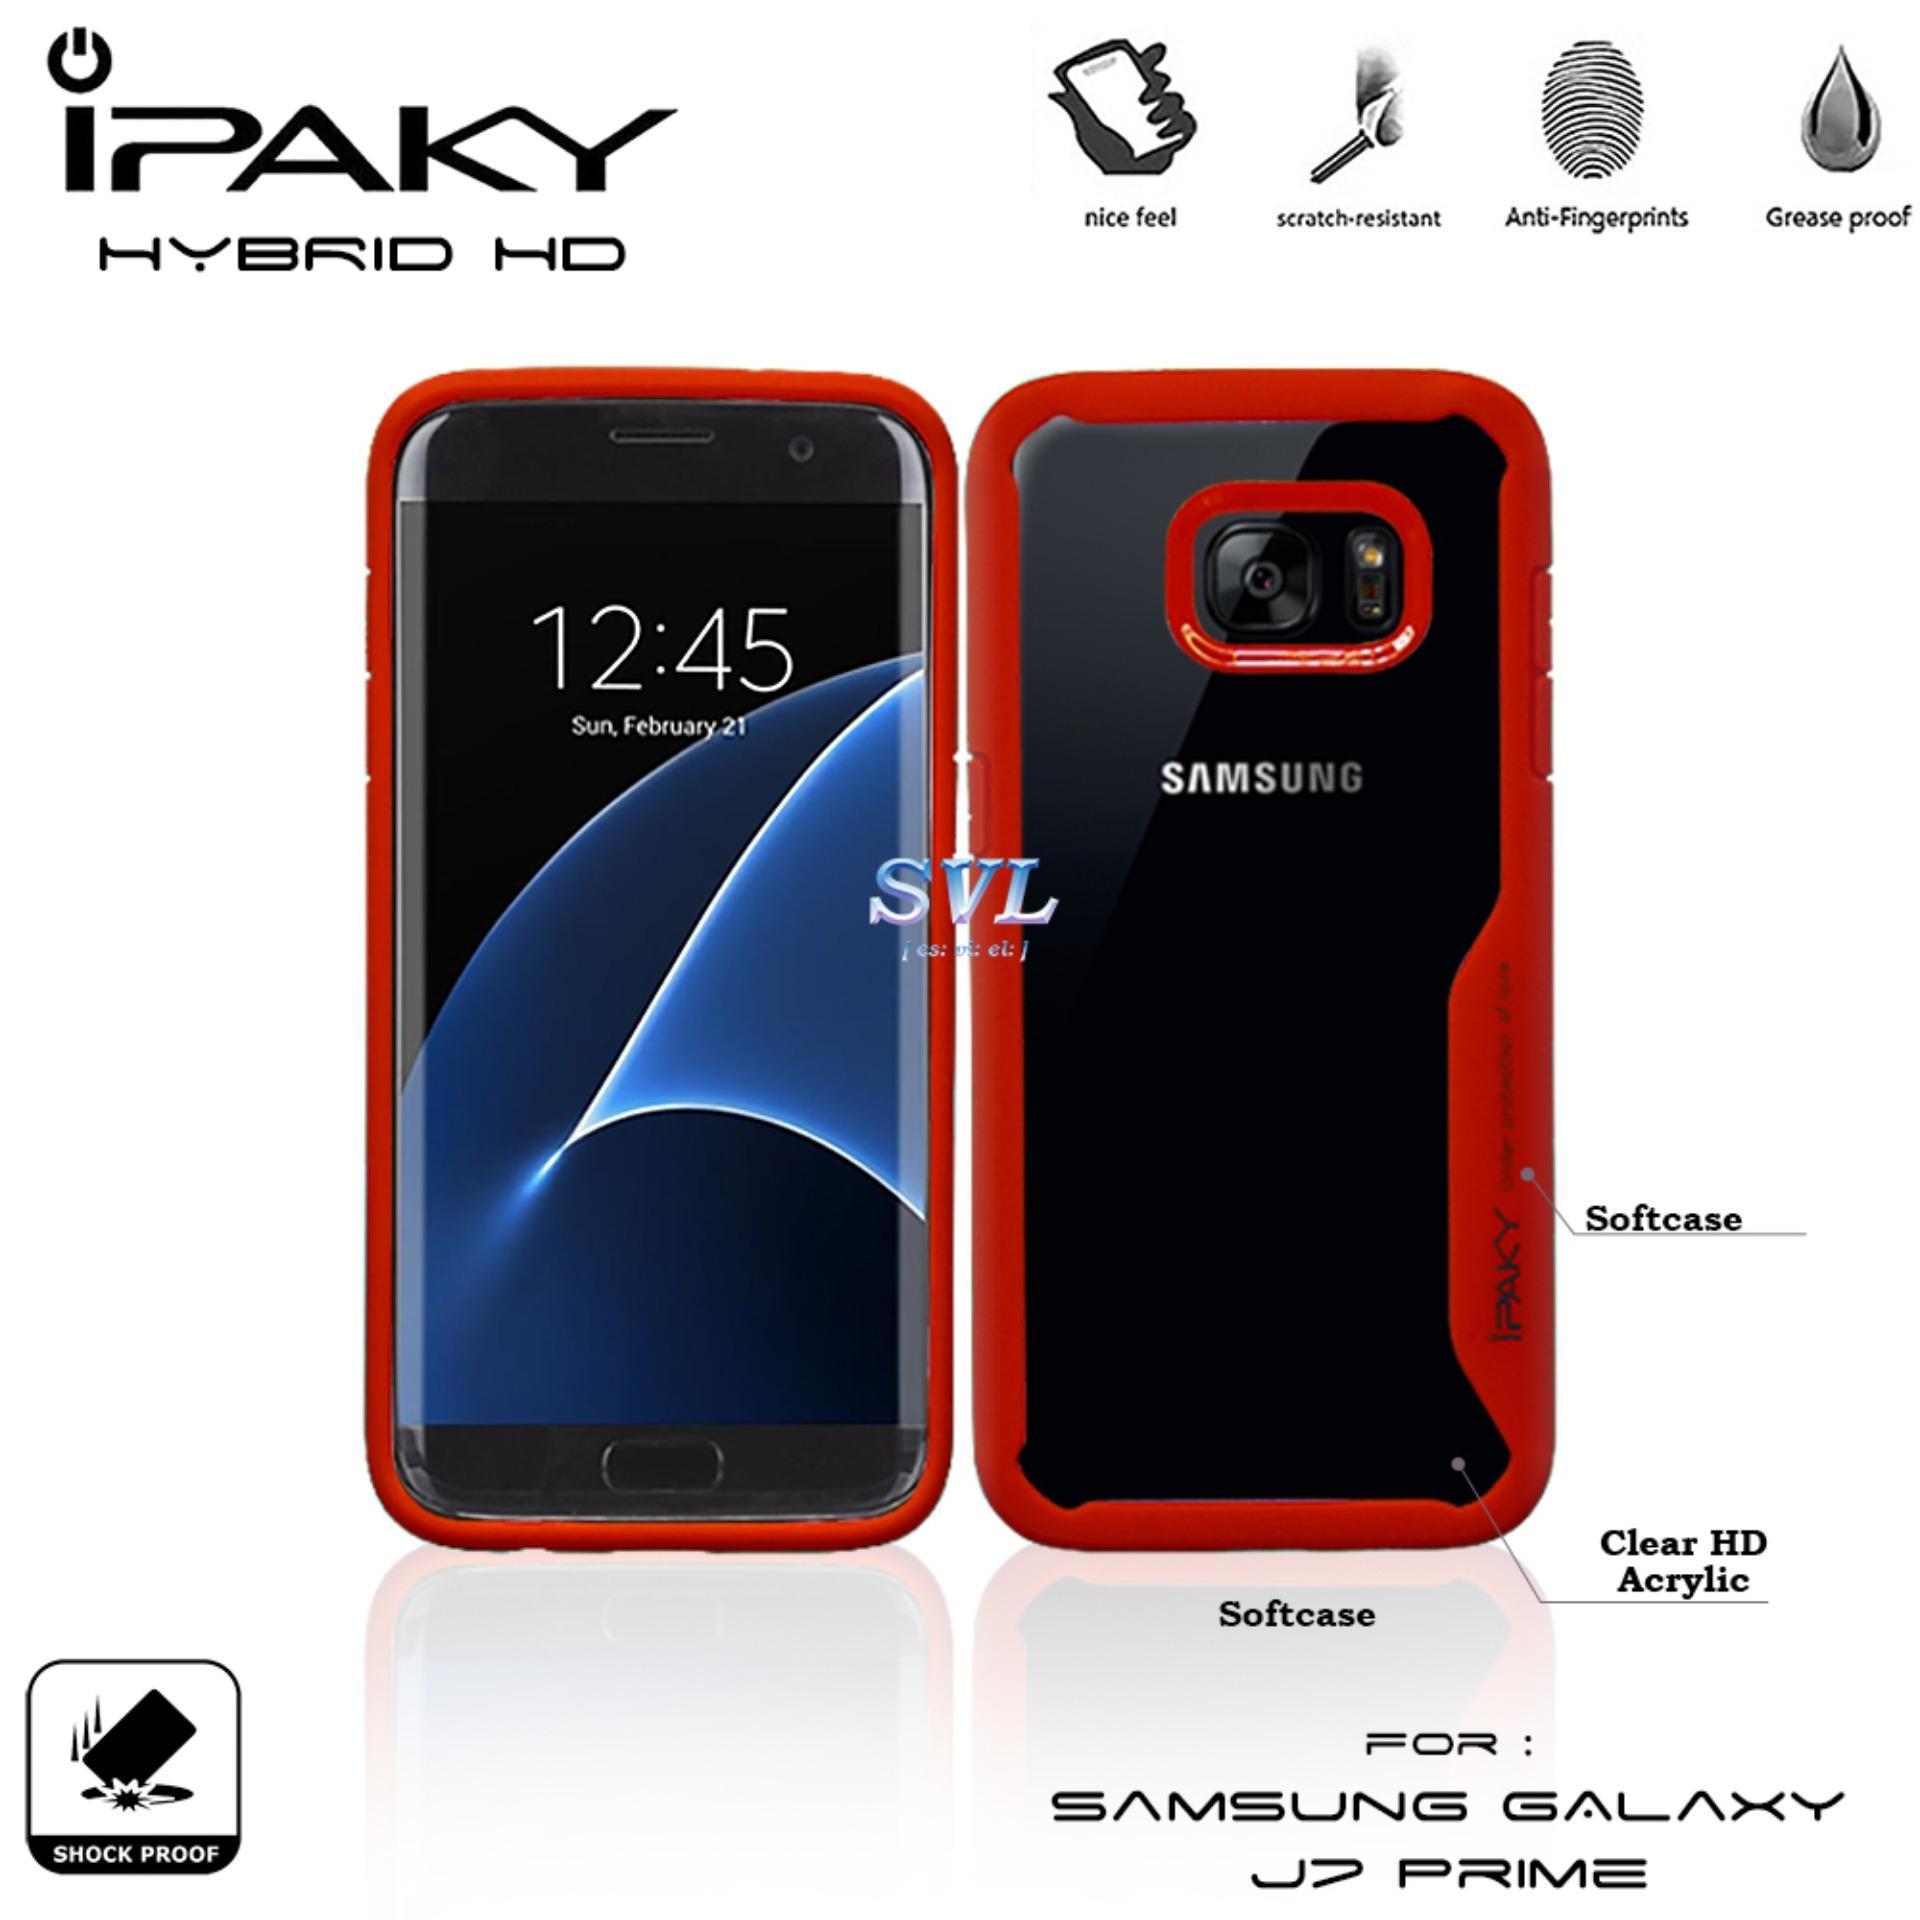 Detail Gambar IPAKY Hybrid HD Acrylic Case for Samsung S7 edge Terbaru